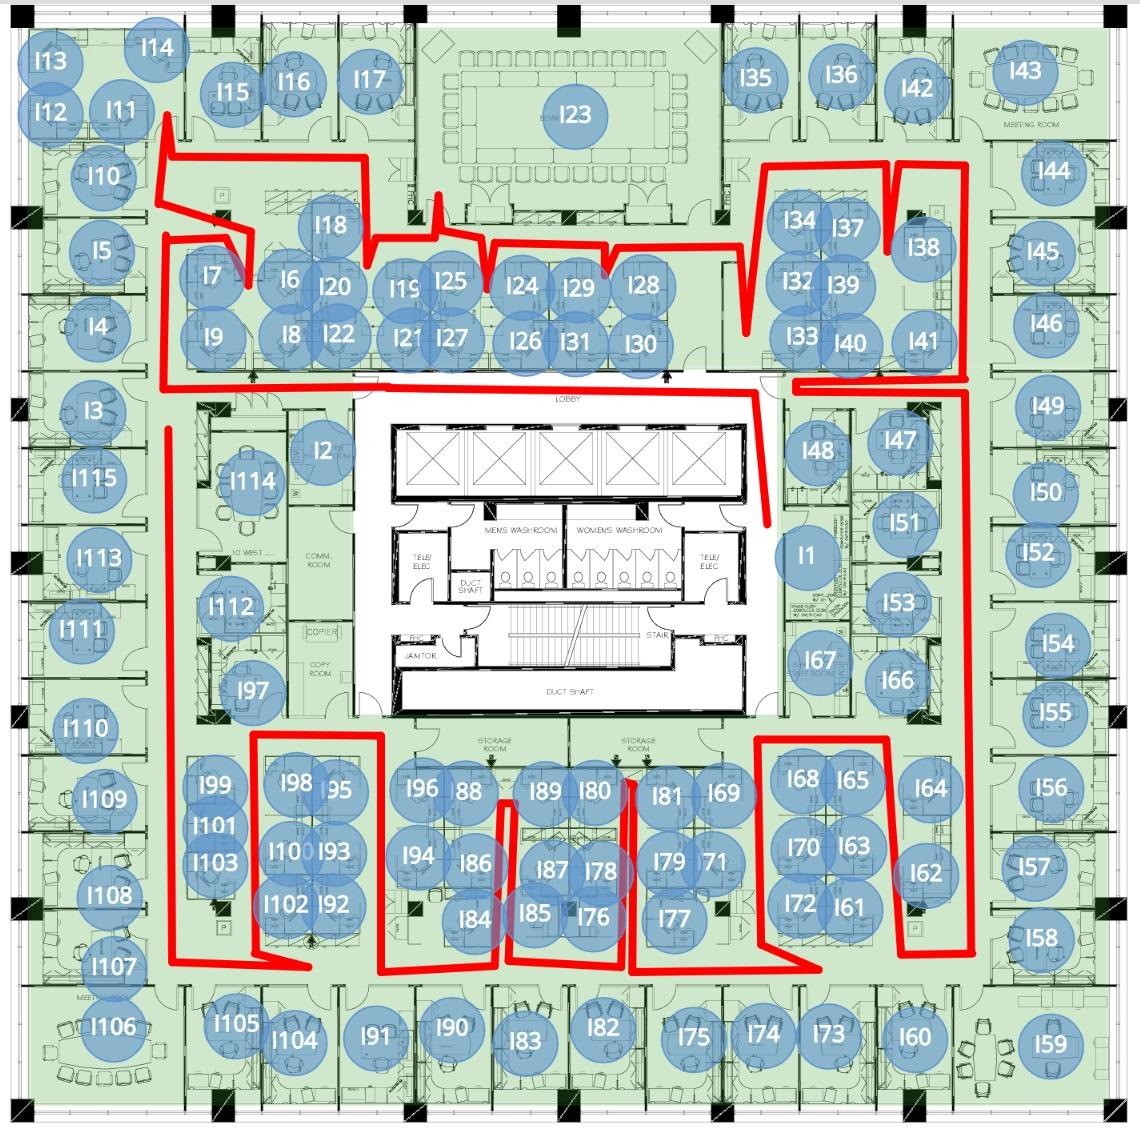 square w walking space utilization route.jpg